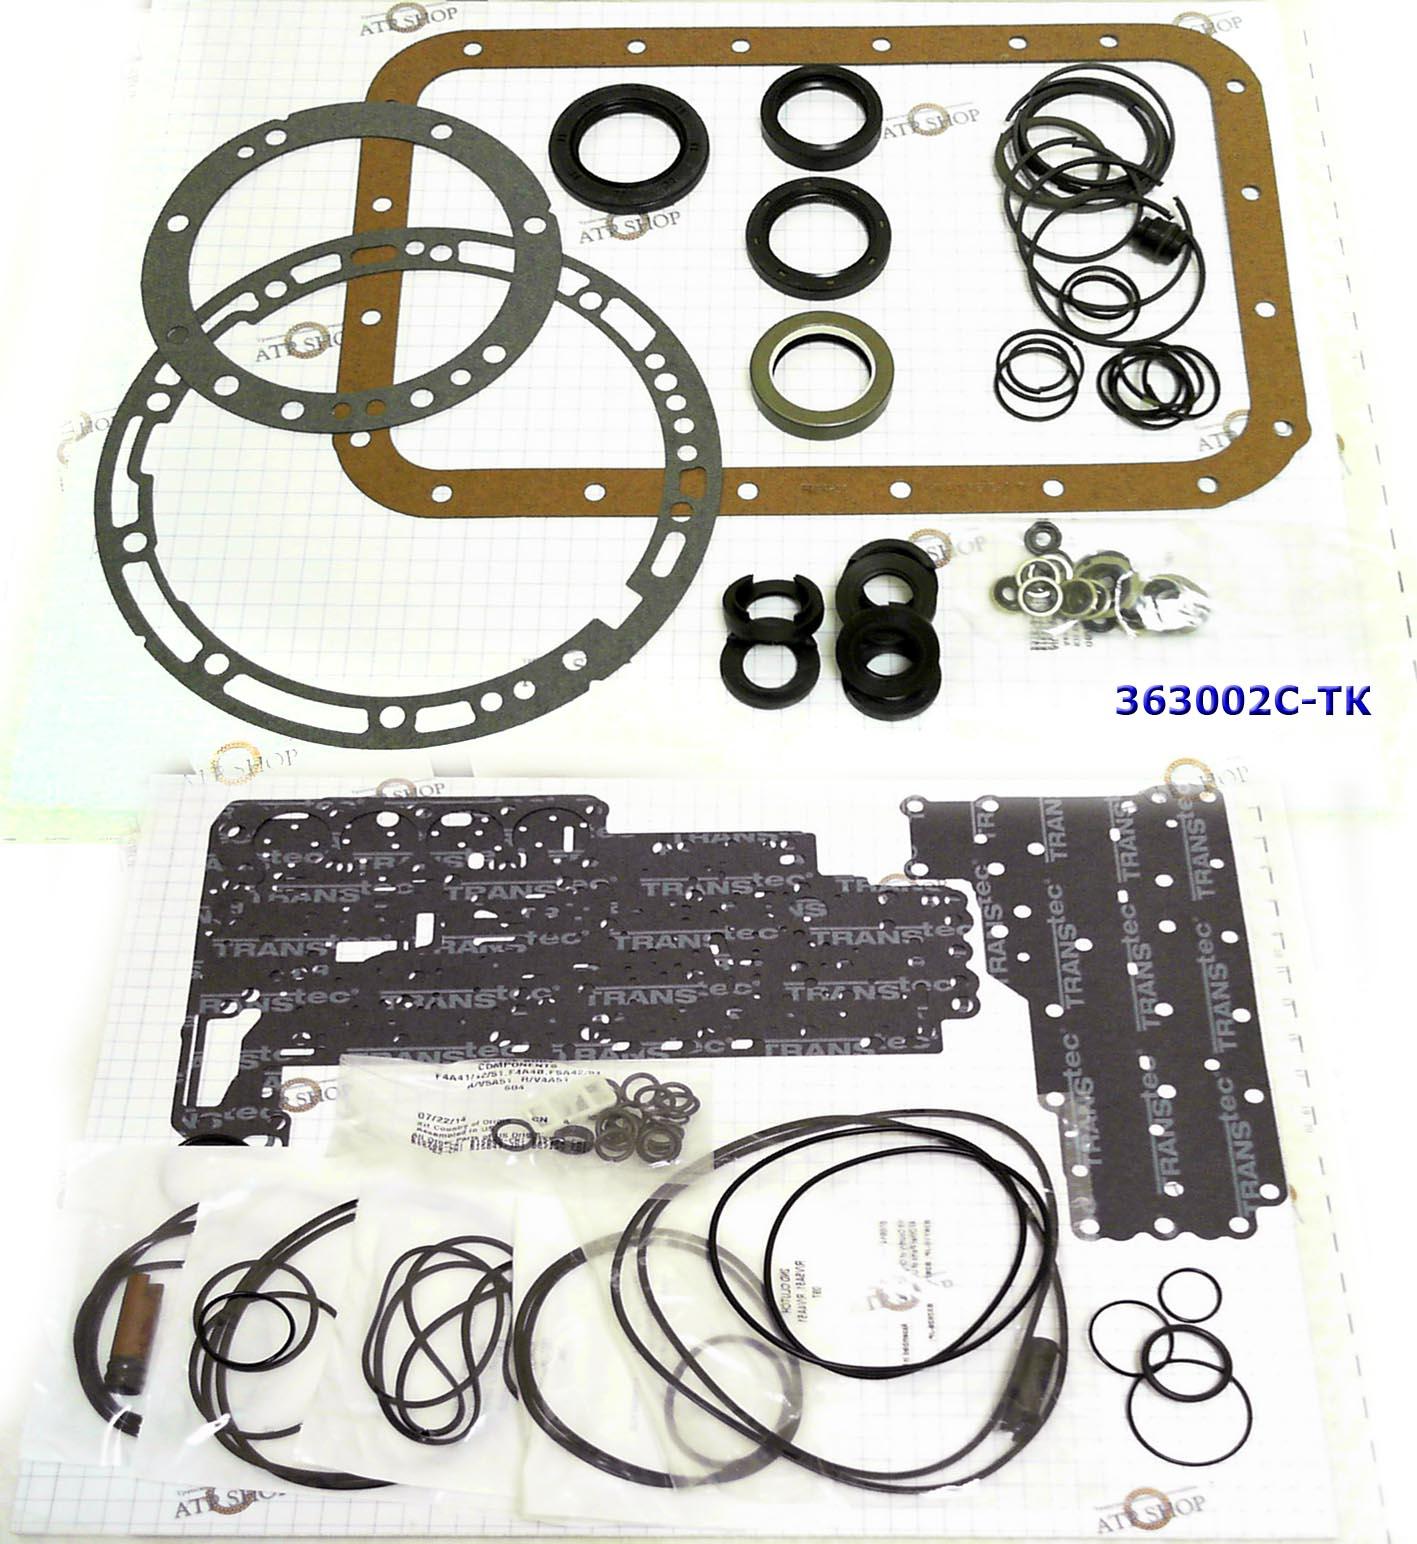 (Ремкомплект\ Оверол кит\ Overhaul Kit), R4/V4A51, R5/V5A51